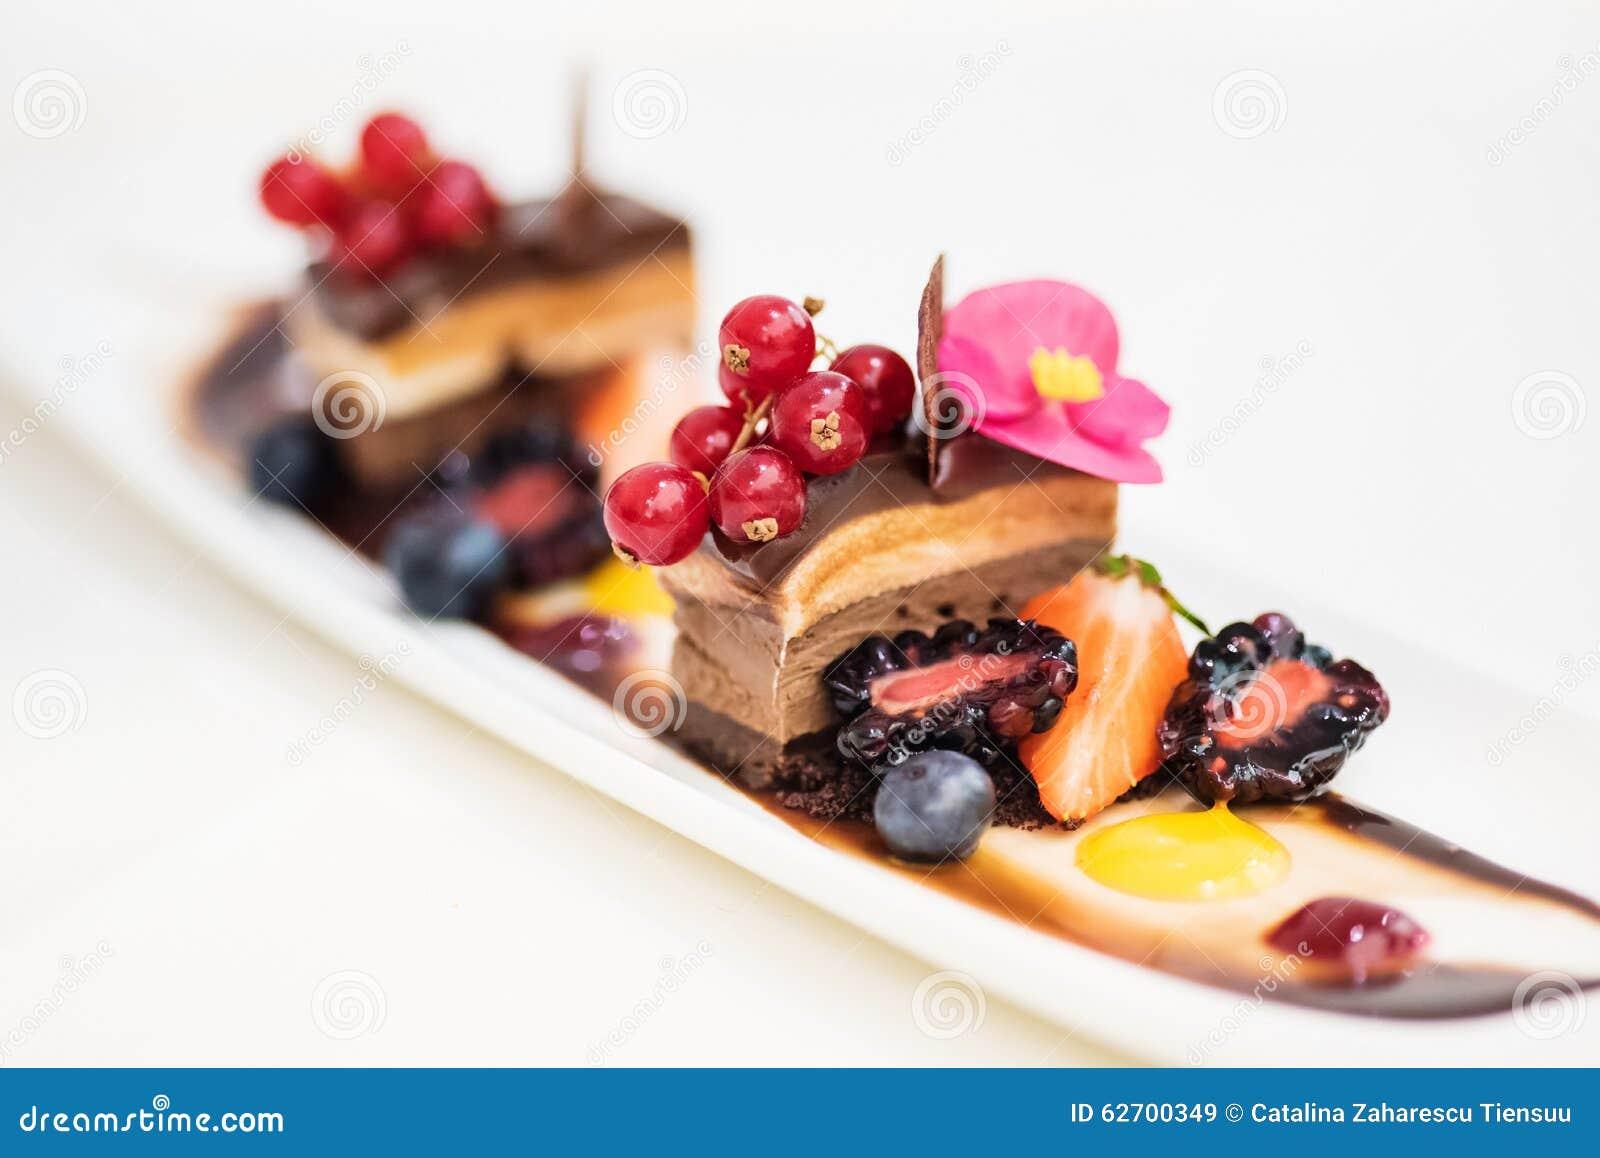 Triple Chocolate Dessert Stock Photo Image 62700349